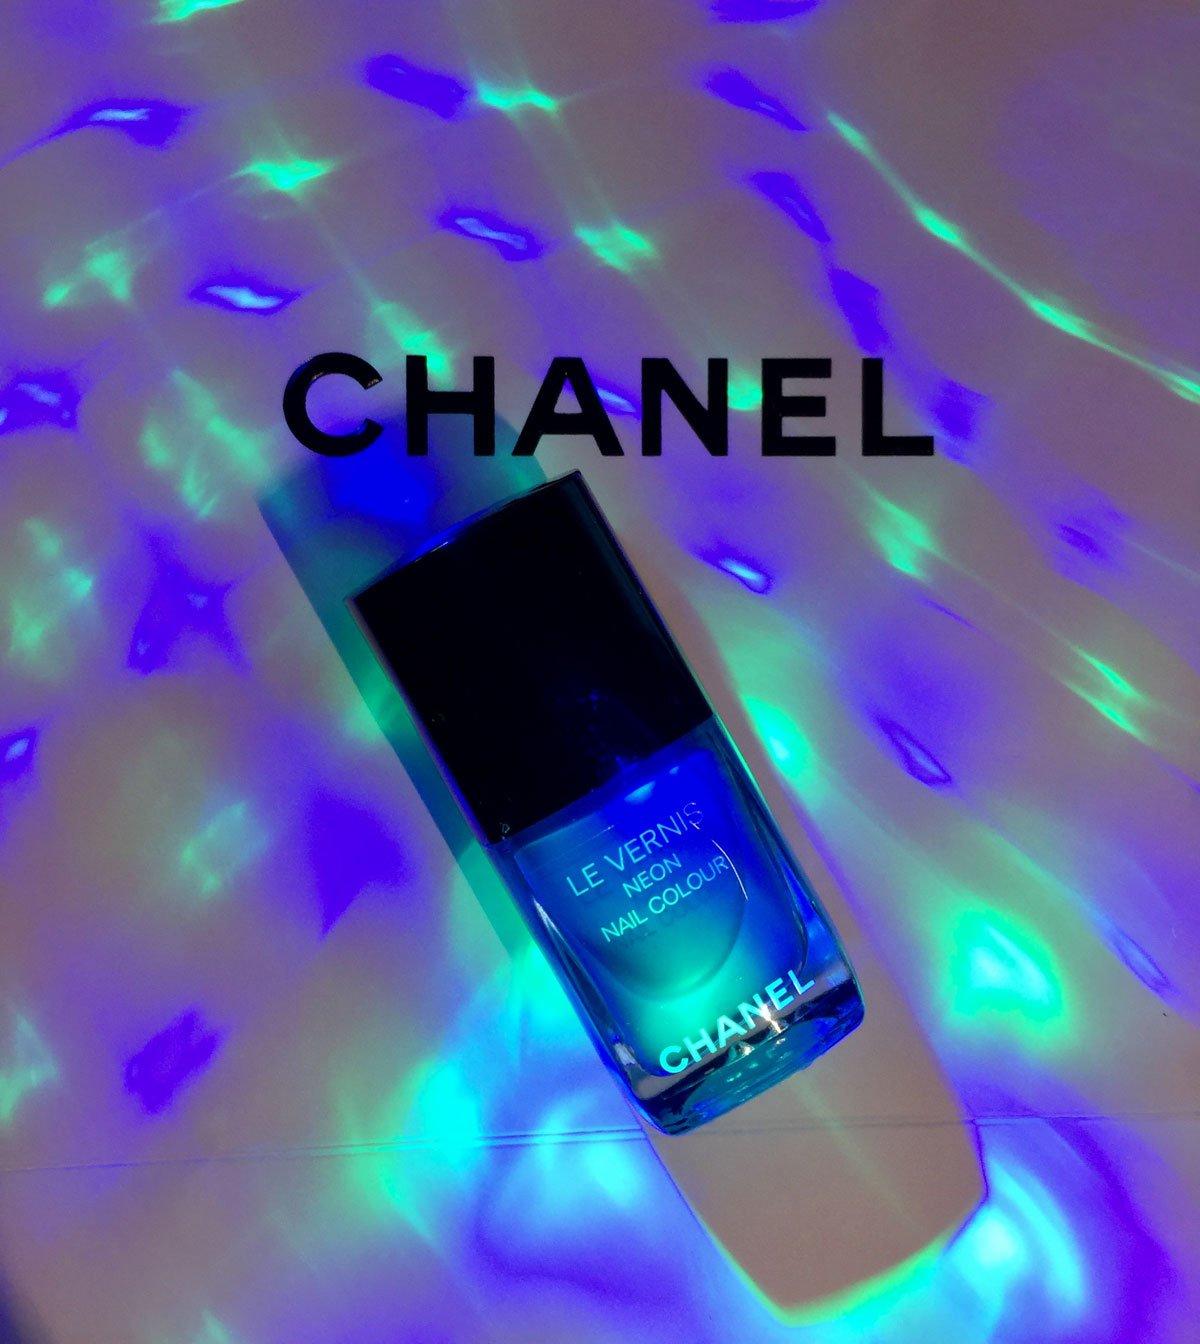 Le Vernis Electric Blu